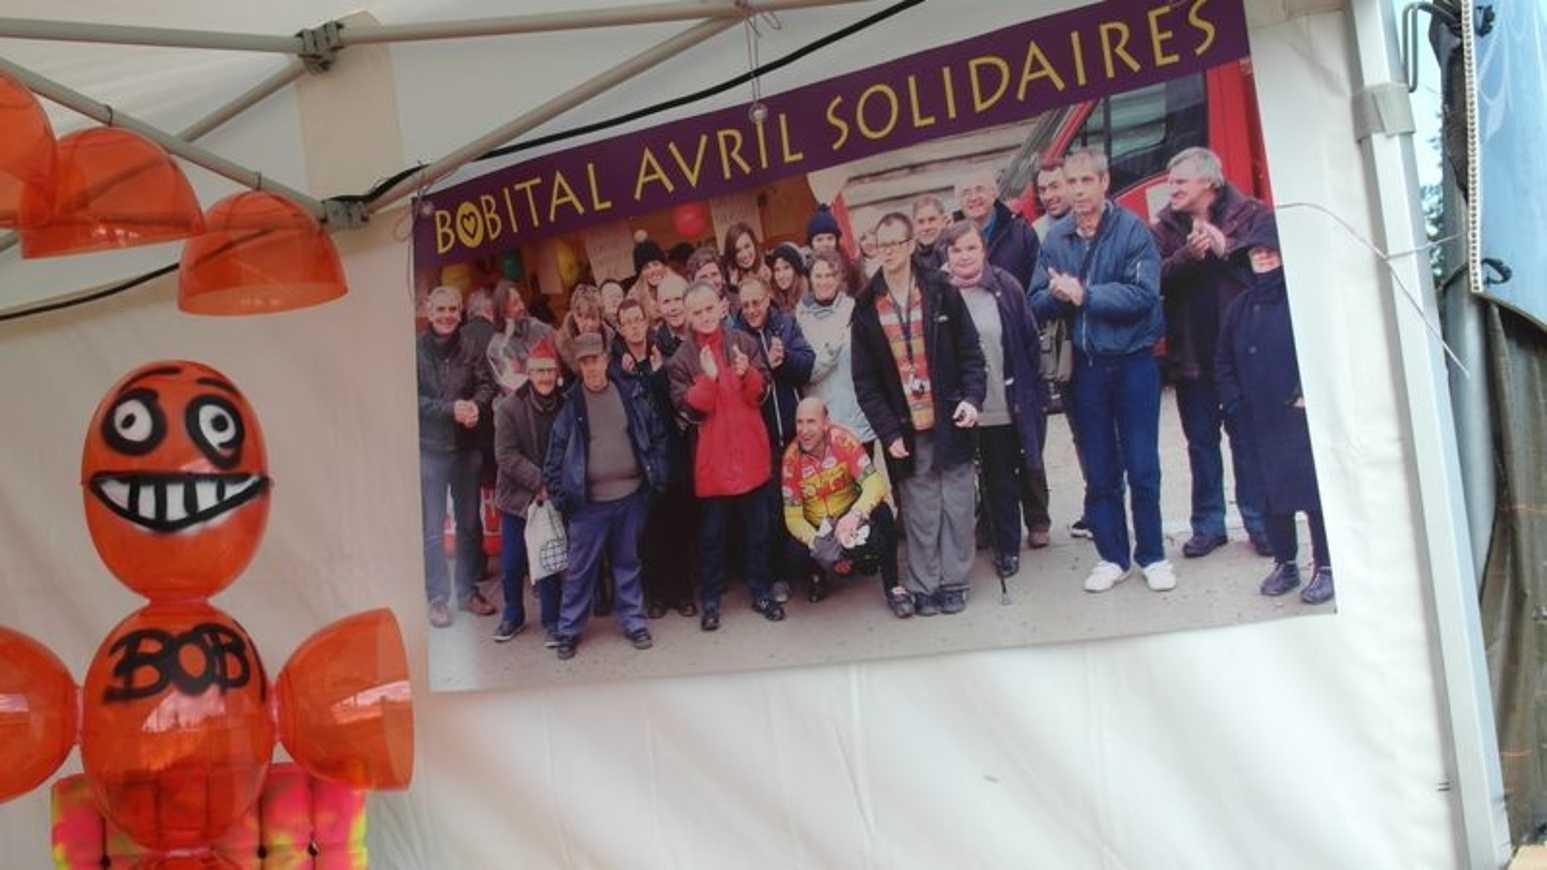 Bobital 2013 : une belle aventure humaine sam1656